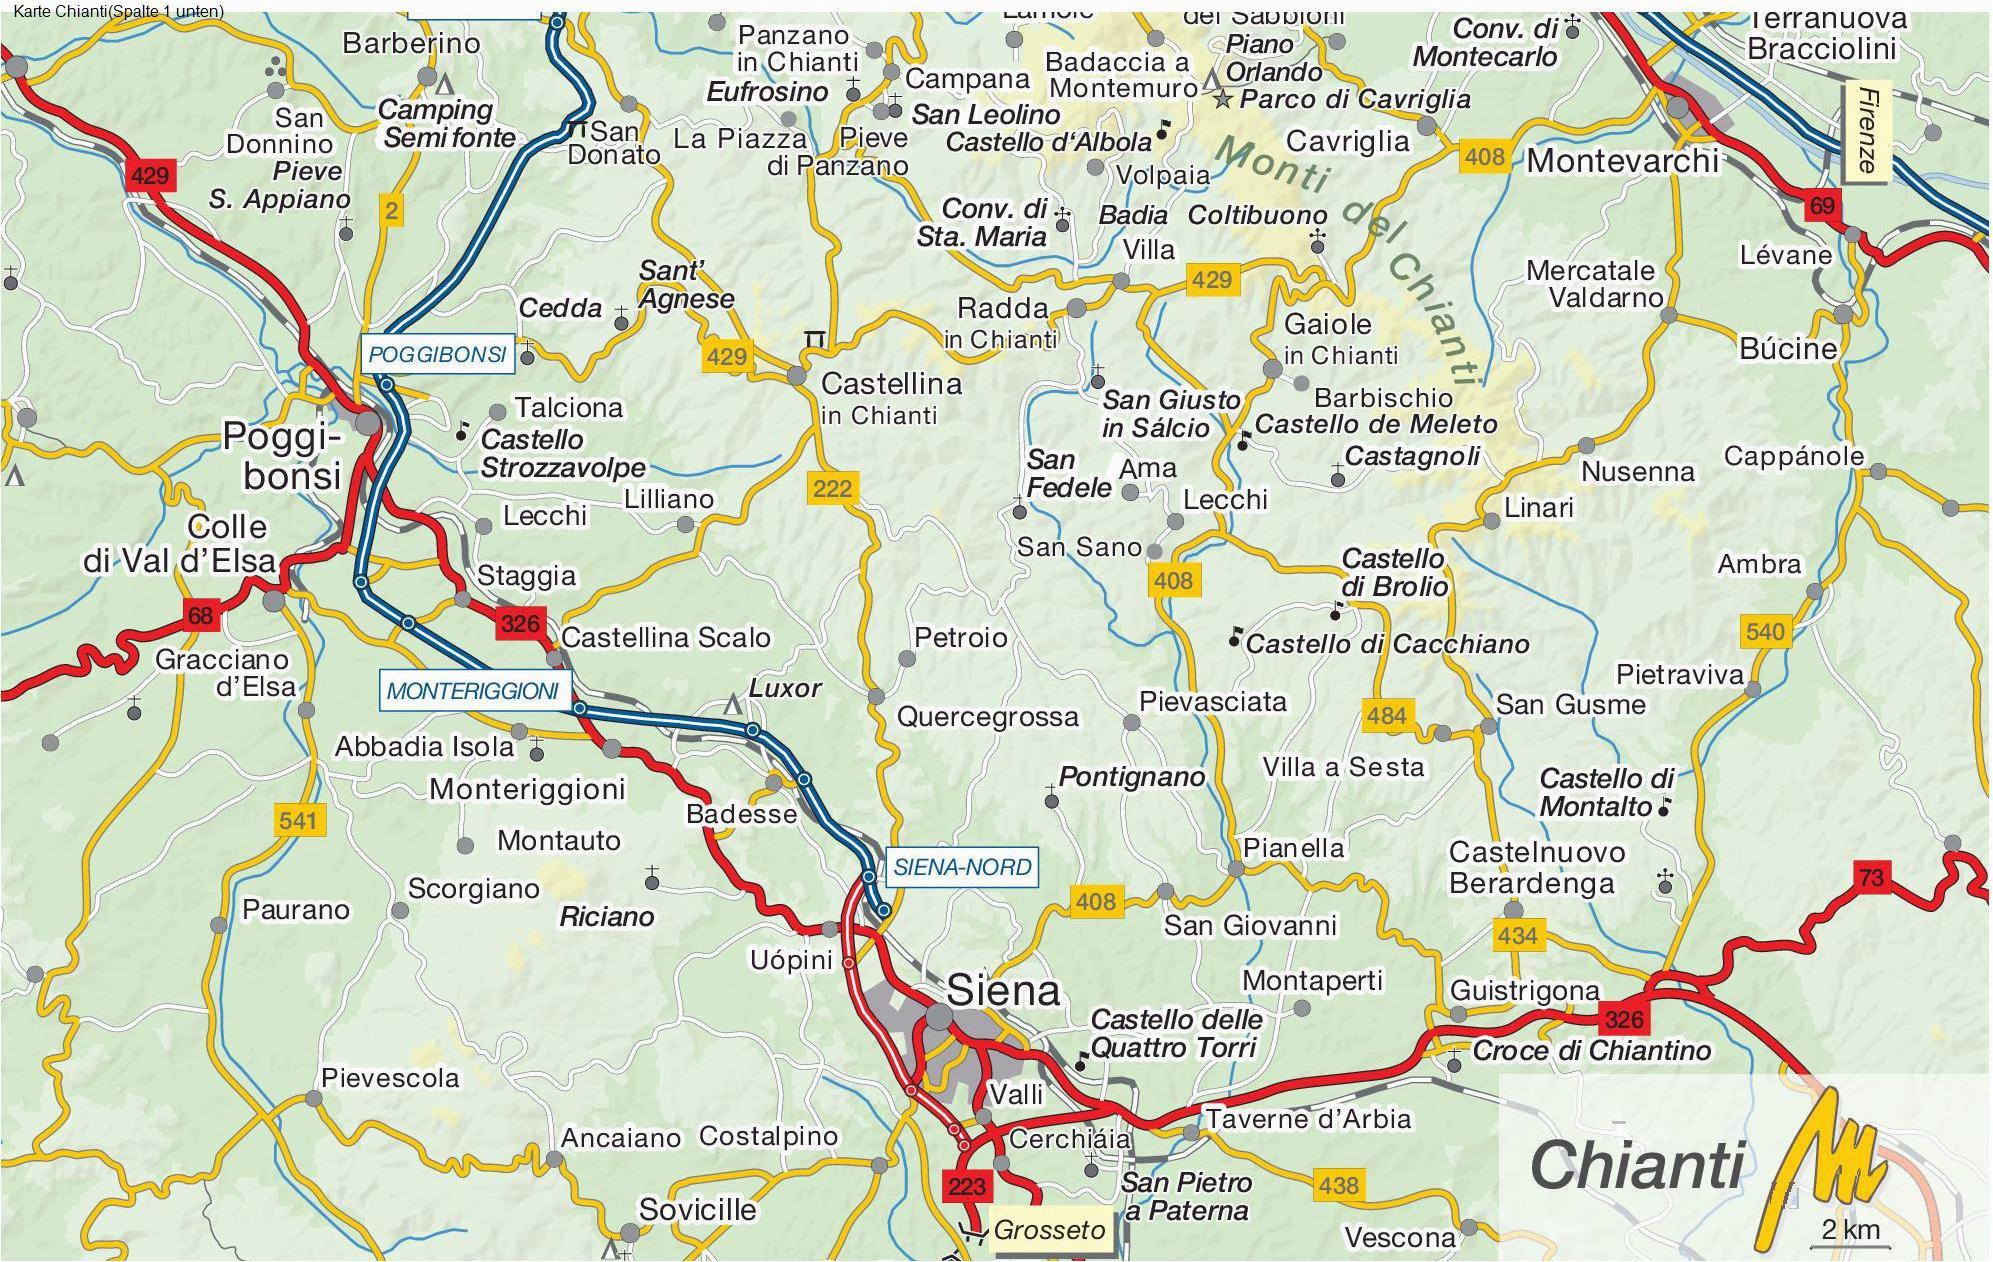 gang territory map california outline toscana line reisefuhrer fancy